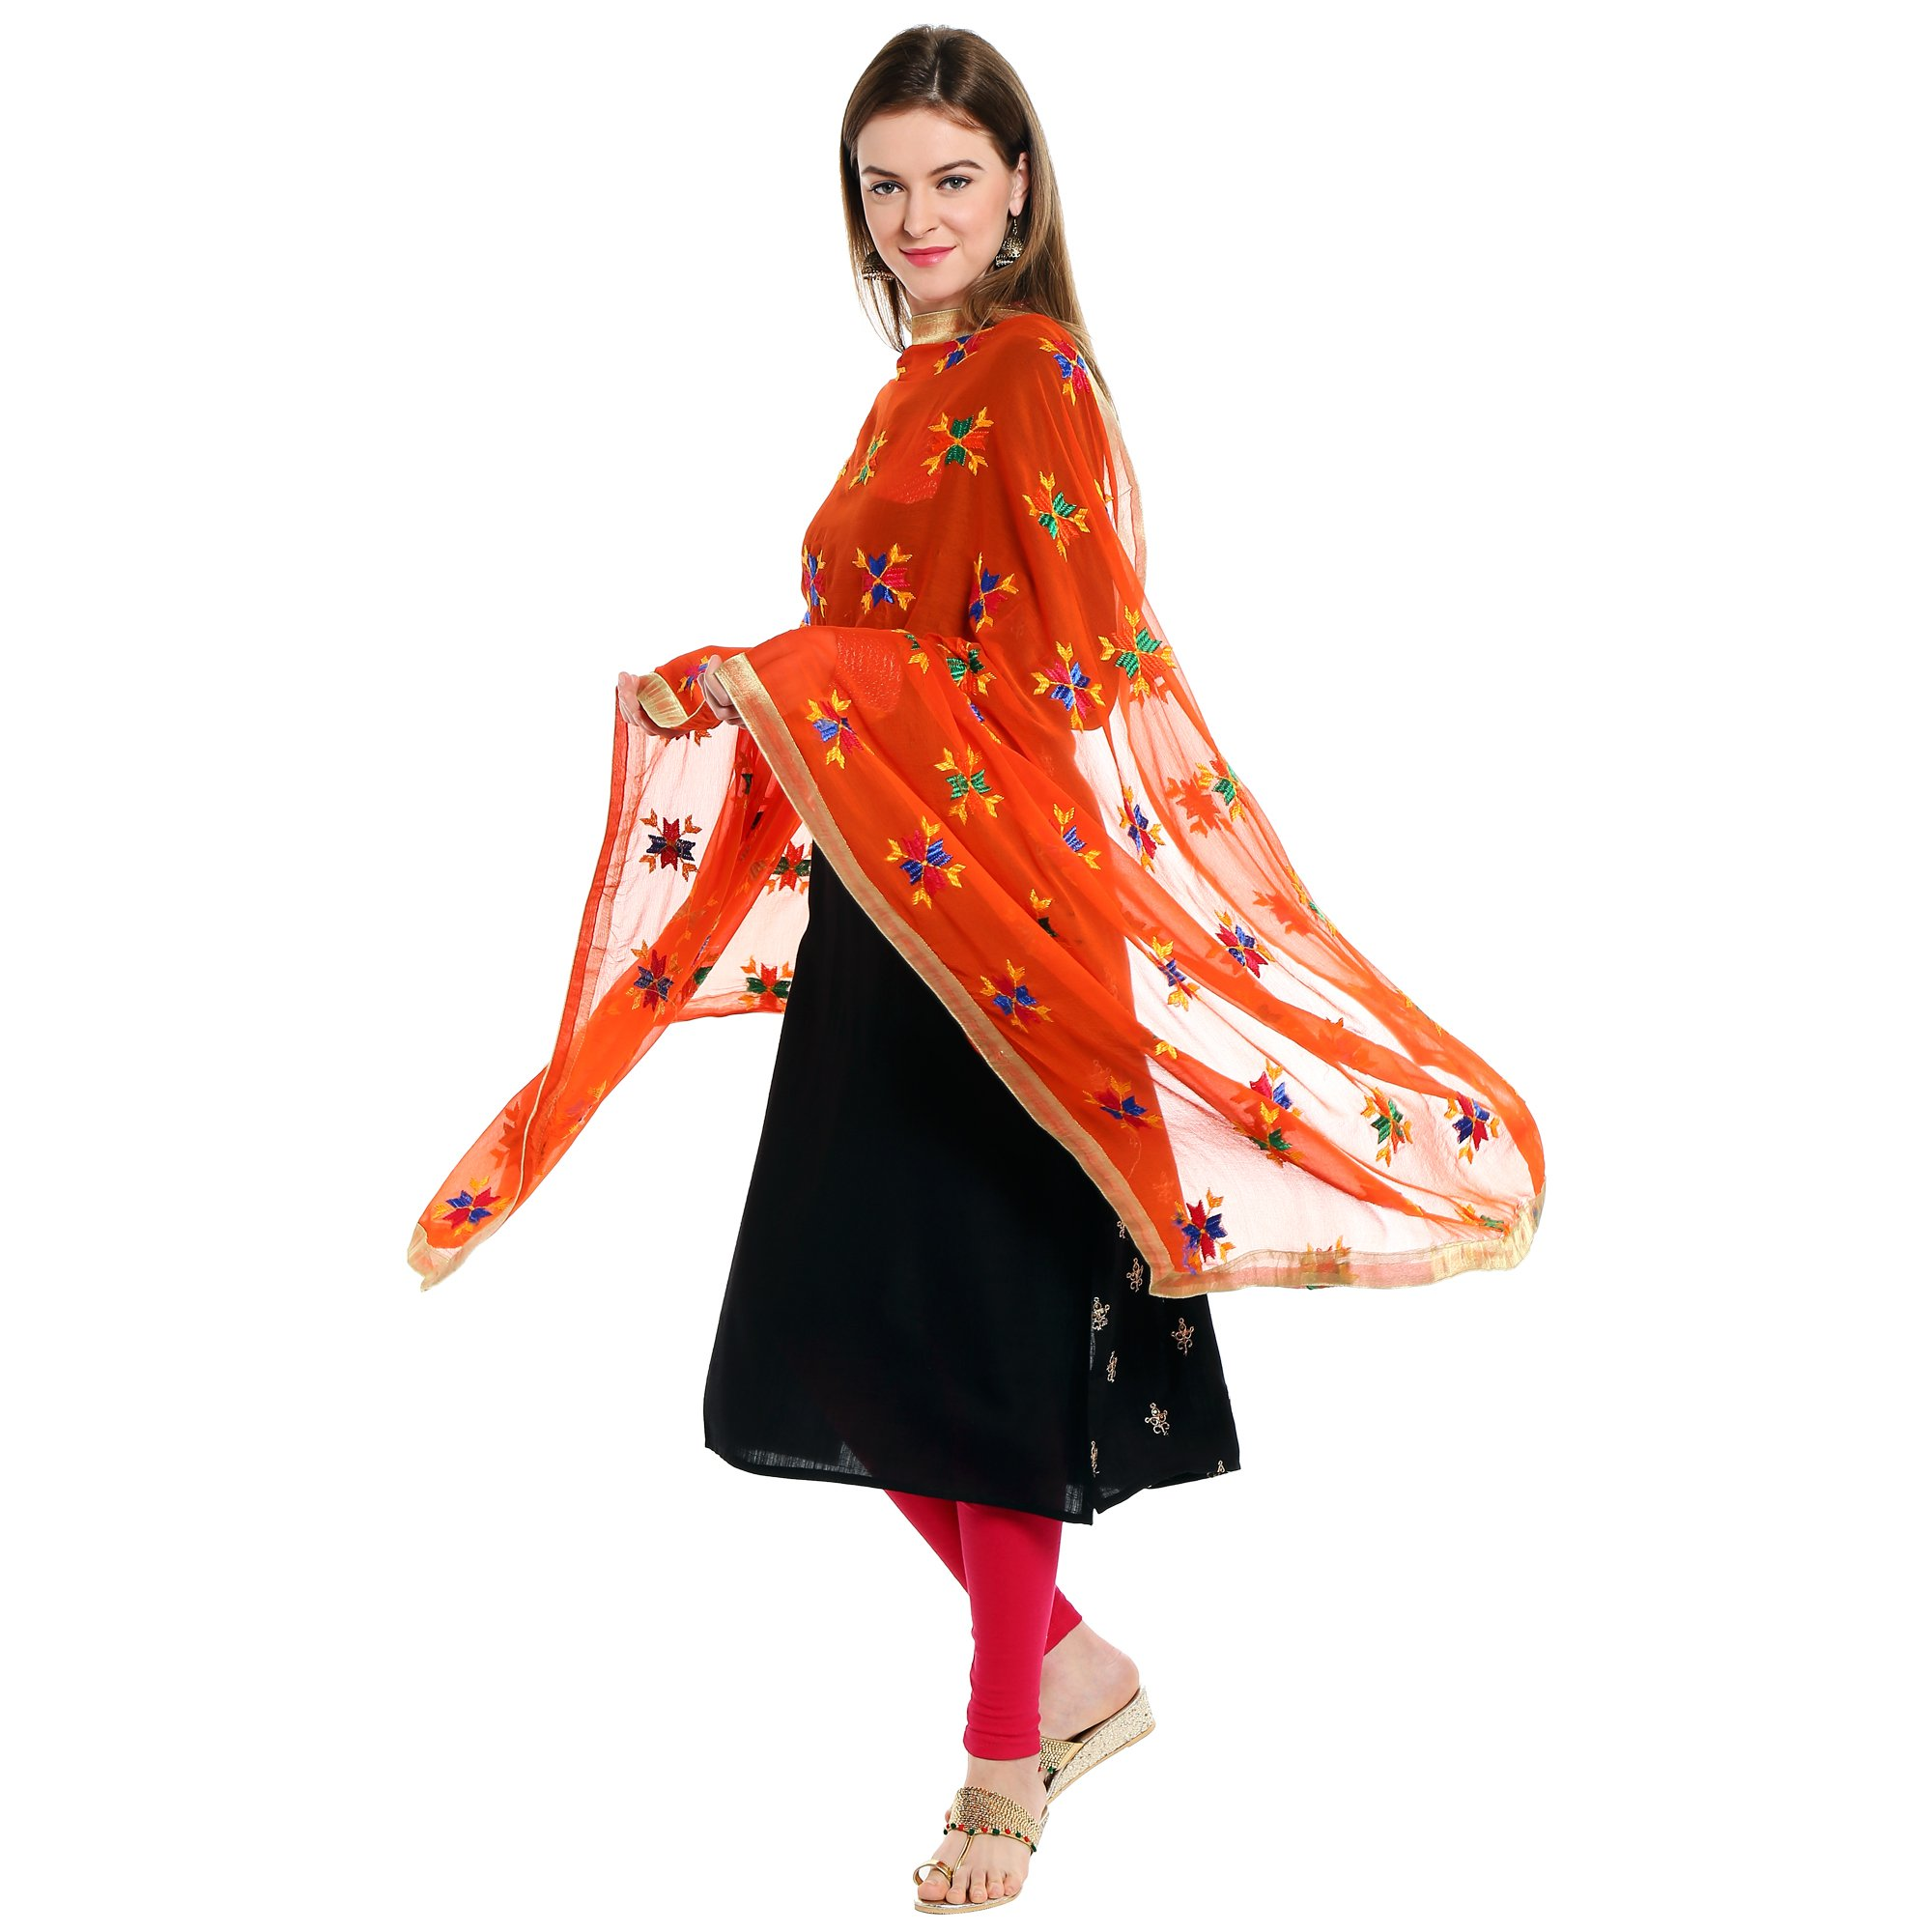 Dupatta Bazaar Indian Phulkari Embroidered Chiffon Dupatta Stole for Women/ Designer Ethnic Lace Border Scarf Shawl/Chunni,Orange